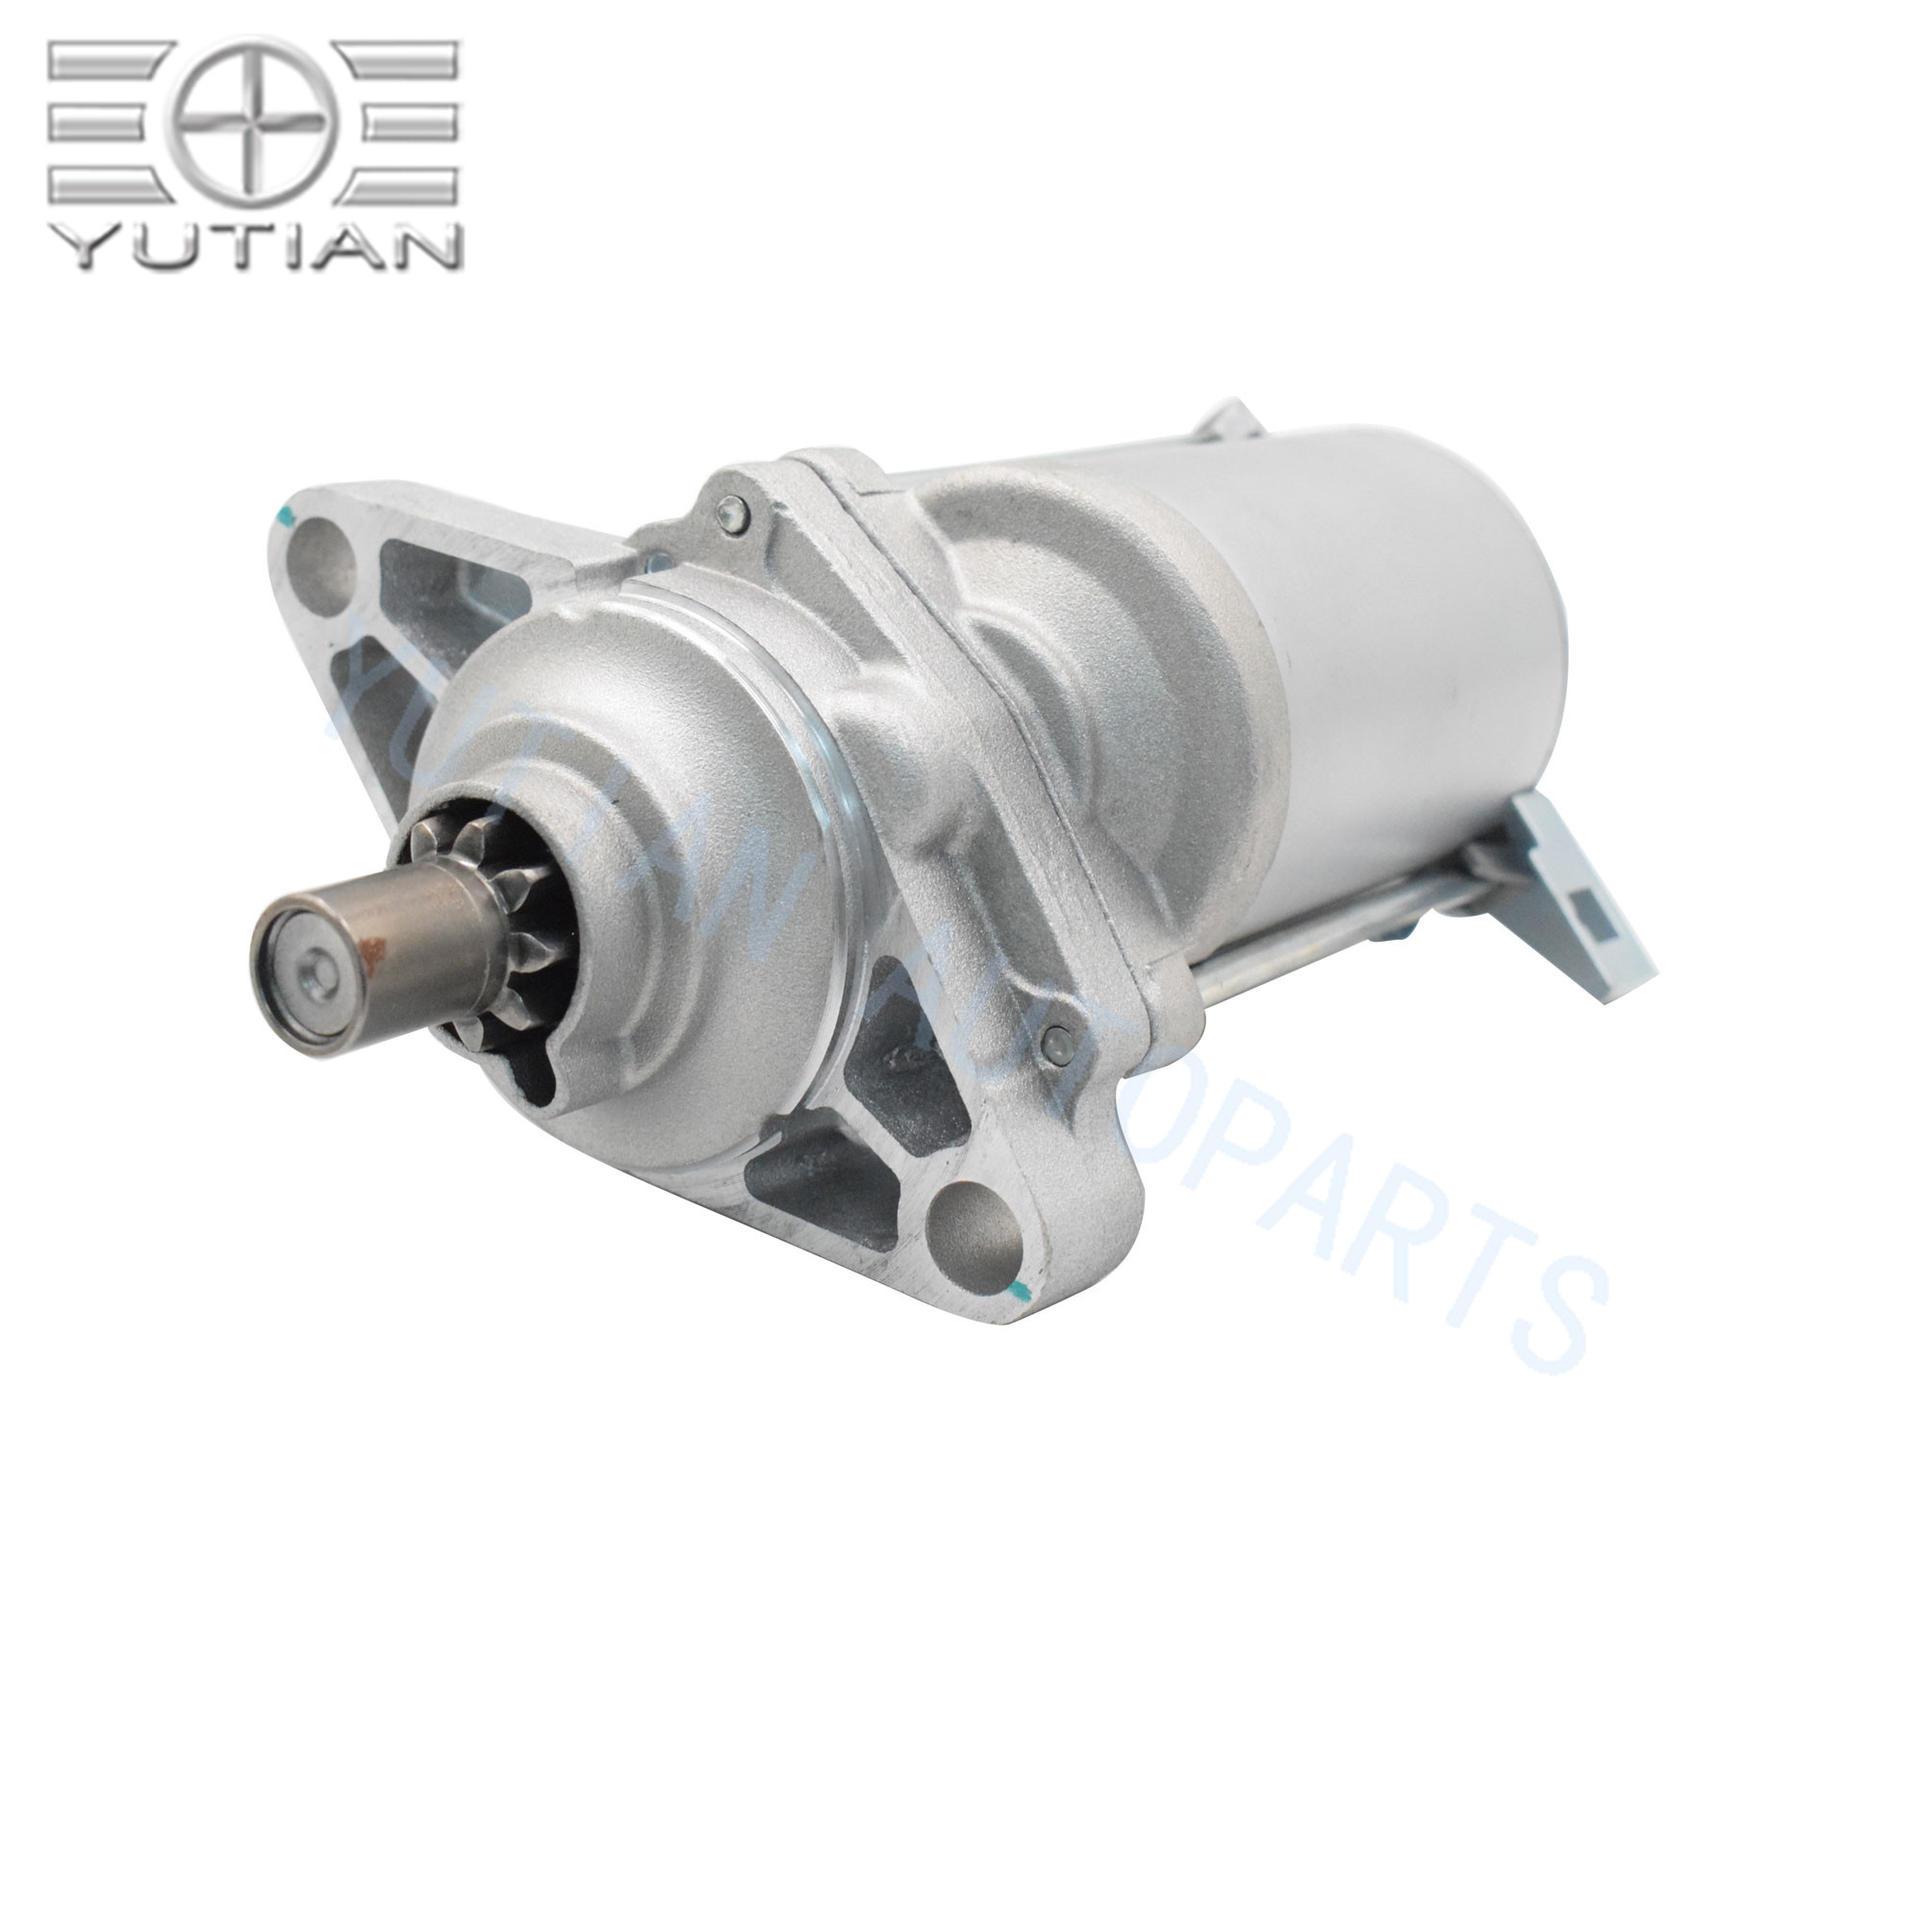 Car Motor For Honda 2003-2007 Accord 3.0L 12V/1.4KW/9T OEM 31200-RCA-A51